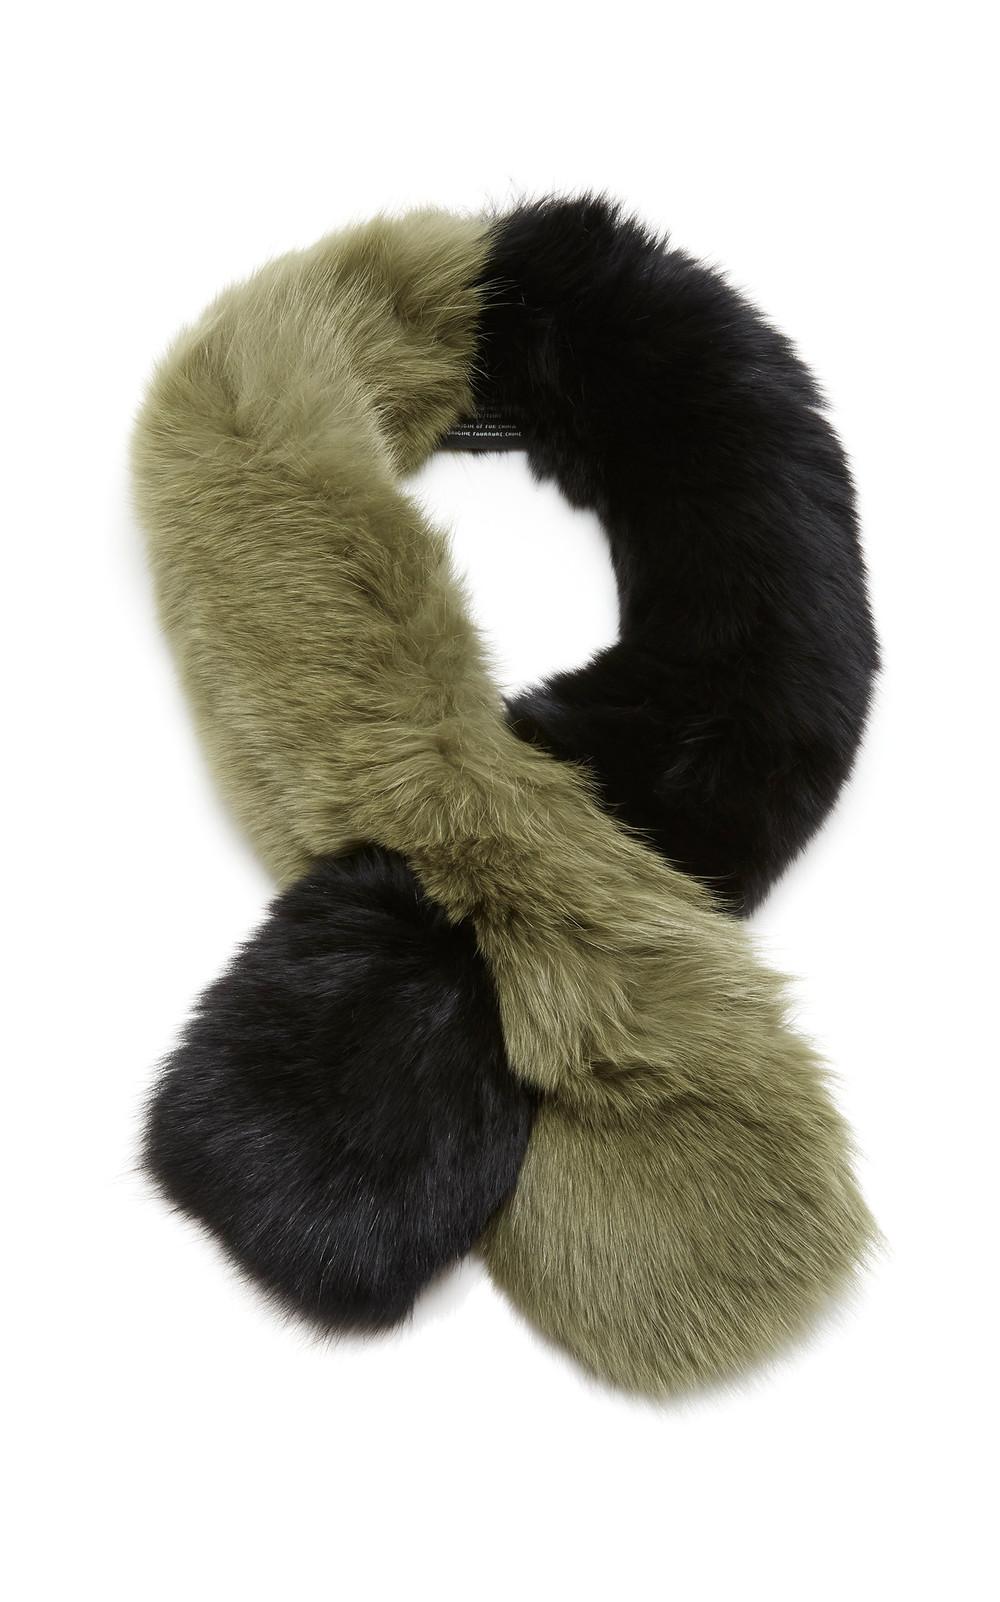 Charlotte Simone Polly Pop Two-Tone Fur Scarf in black